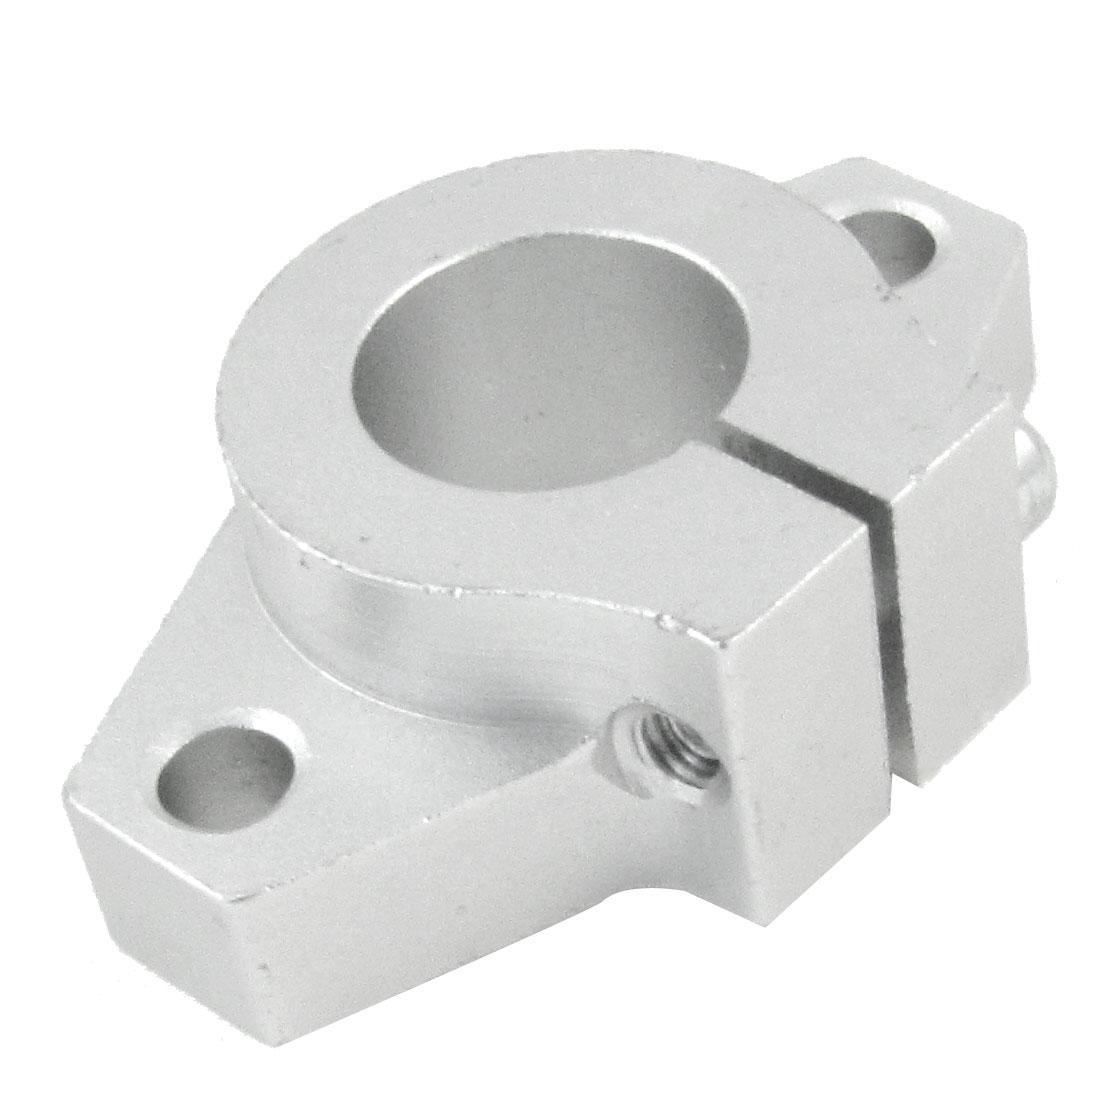 Pillow Shape 16mm Inner Diameter Shaft Support Aluminum Silver Tone